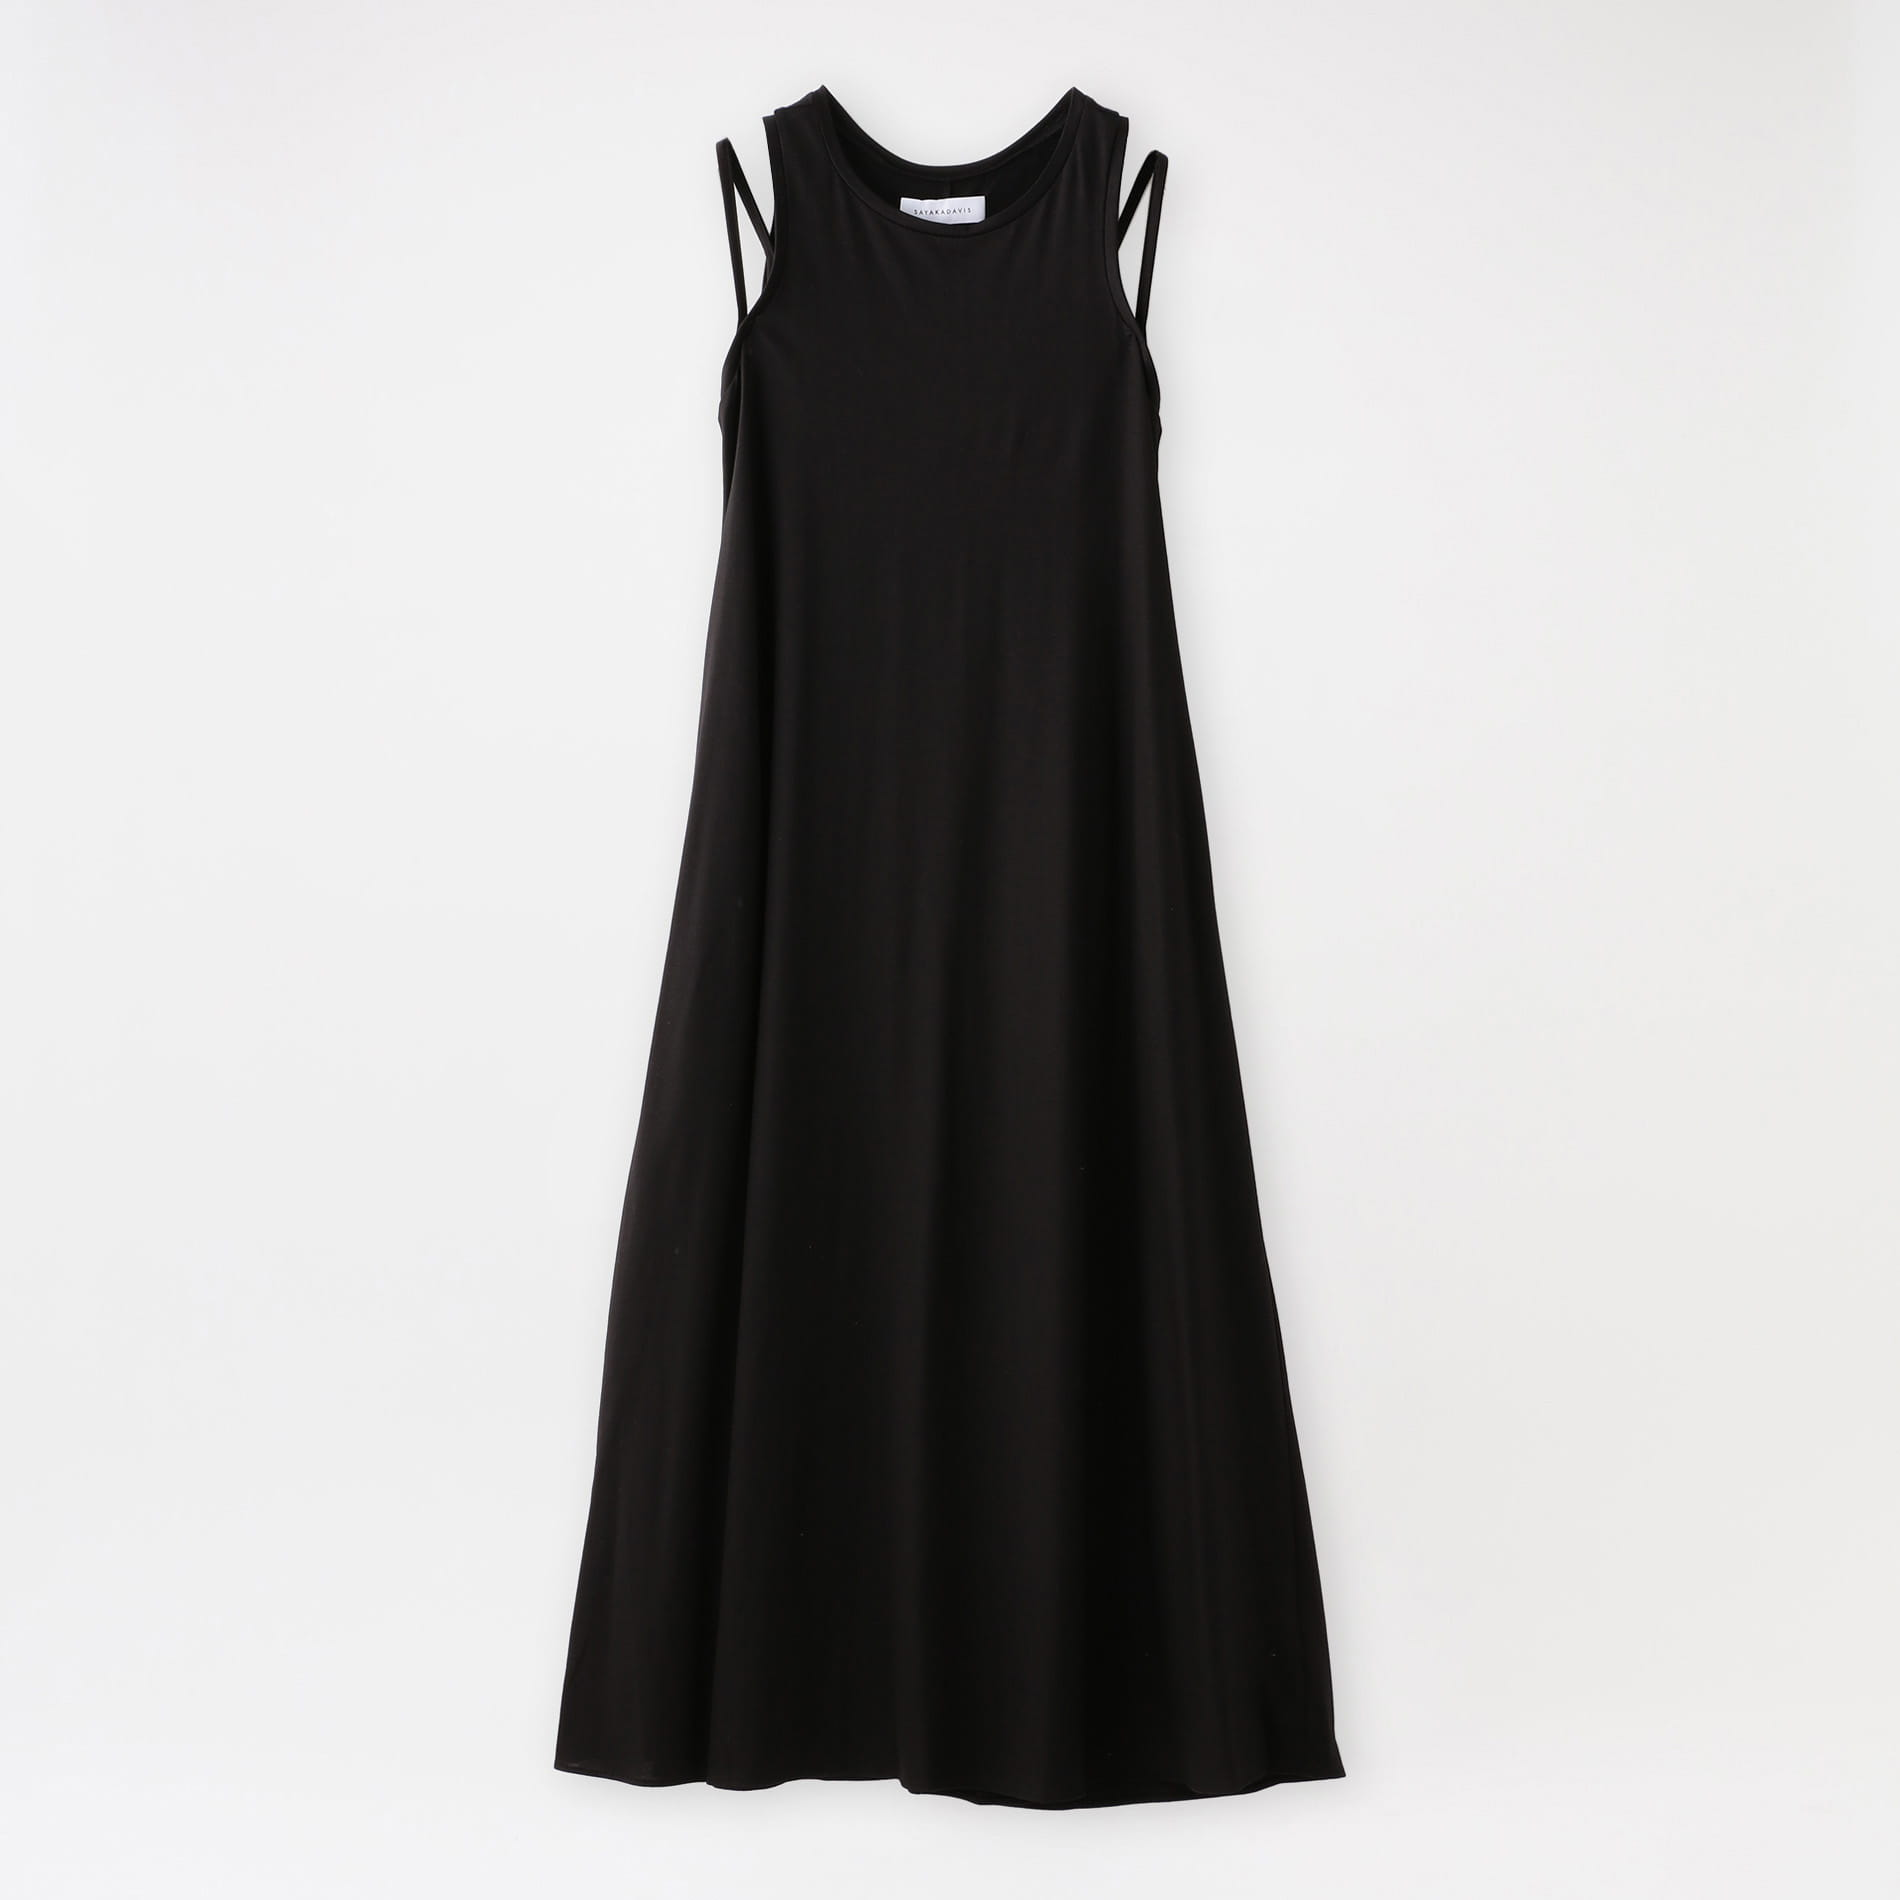 【返品送料無料】【SAYAKA DAVIS】WOMEN Double Strap Jersey Dress MCS34-GLC